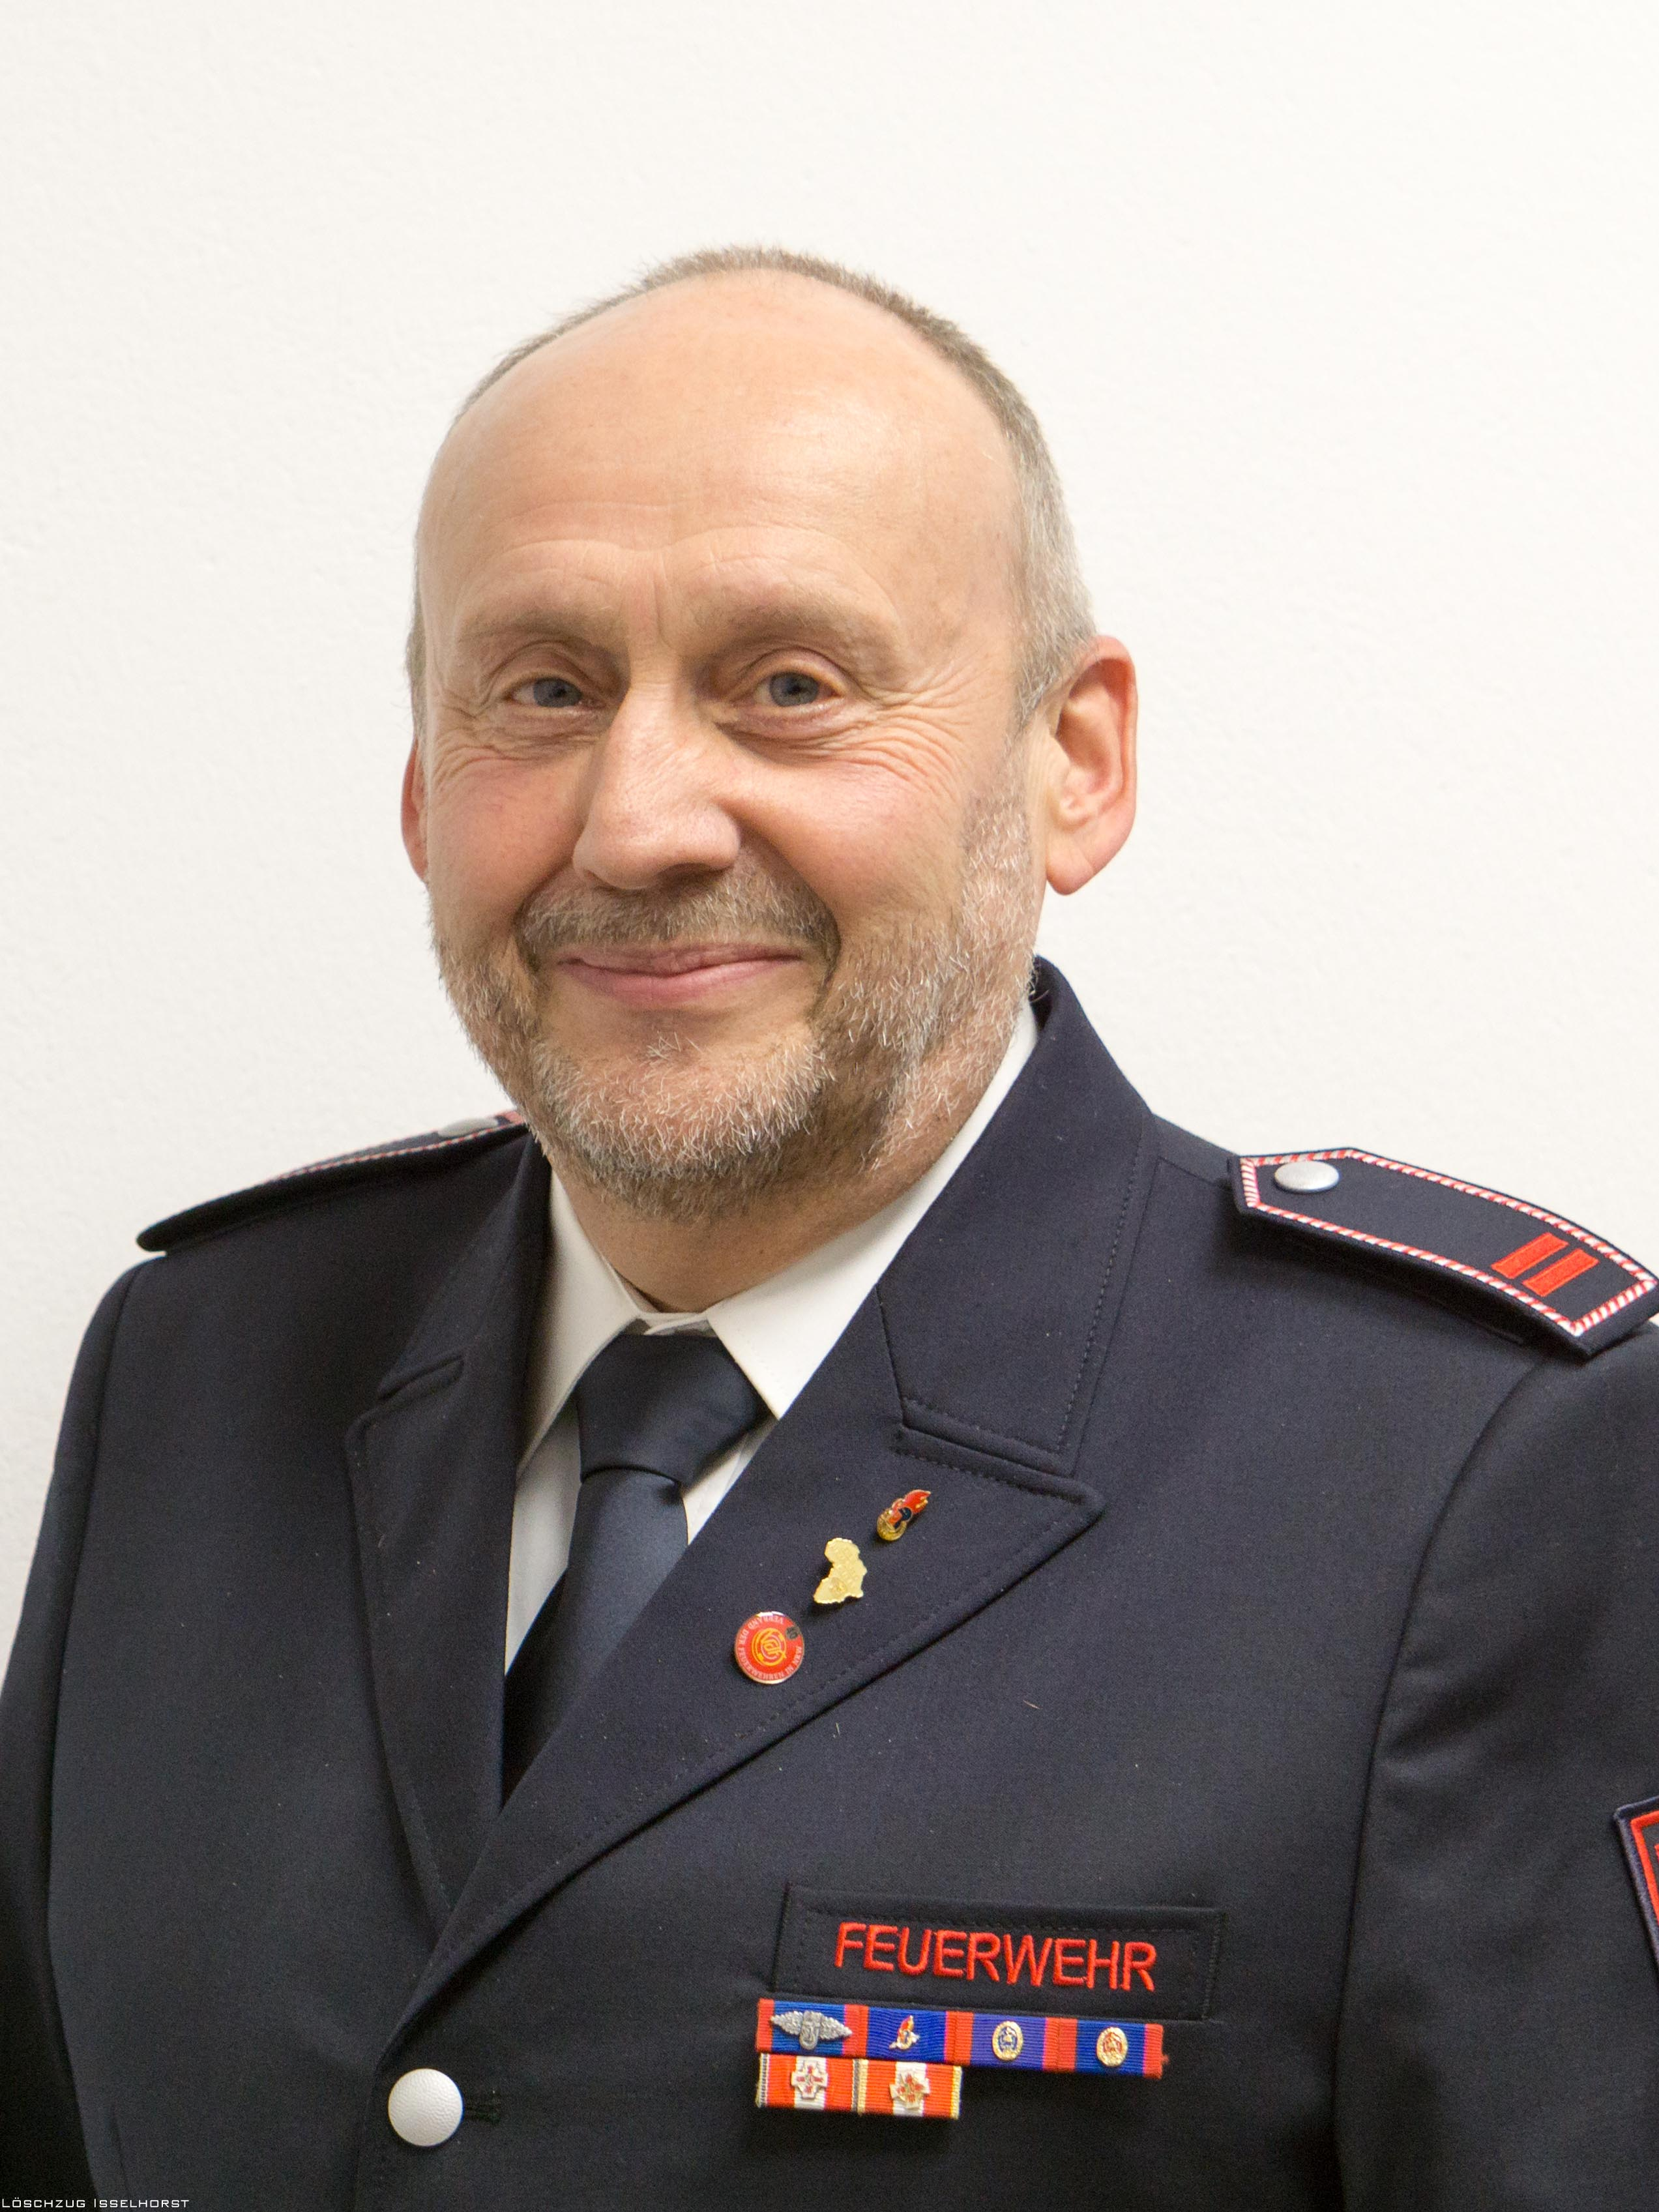 Thomas Uellendahl